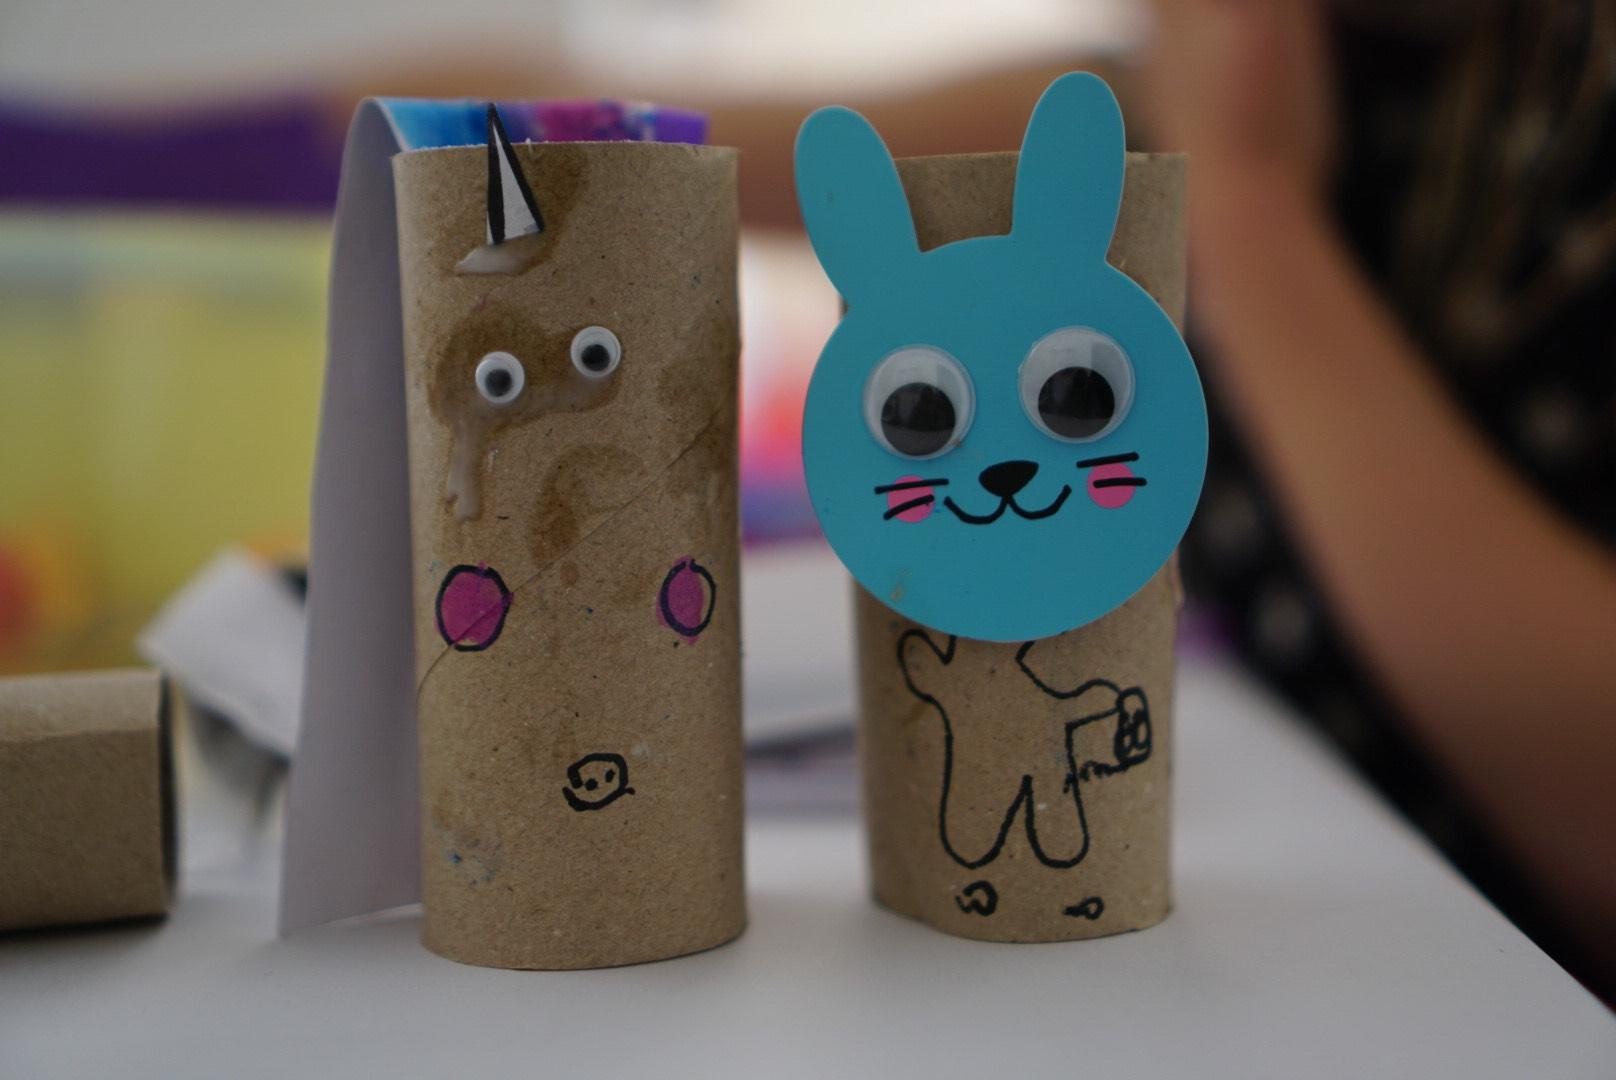 Homeschooling week 3 crafts with toilet rolls